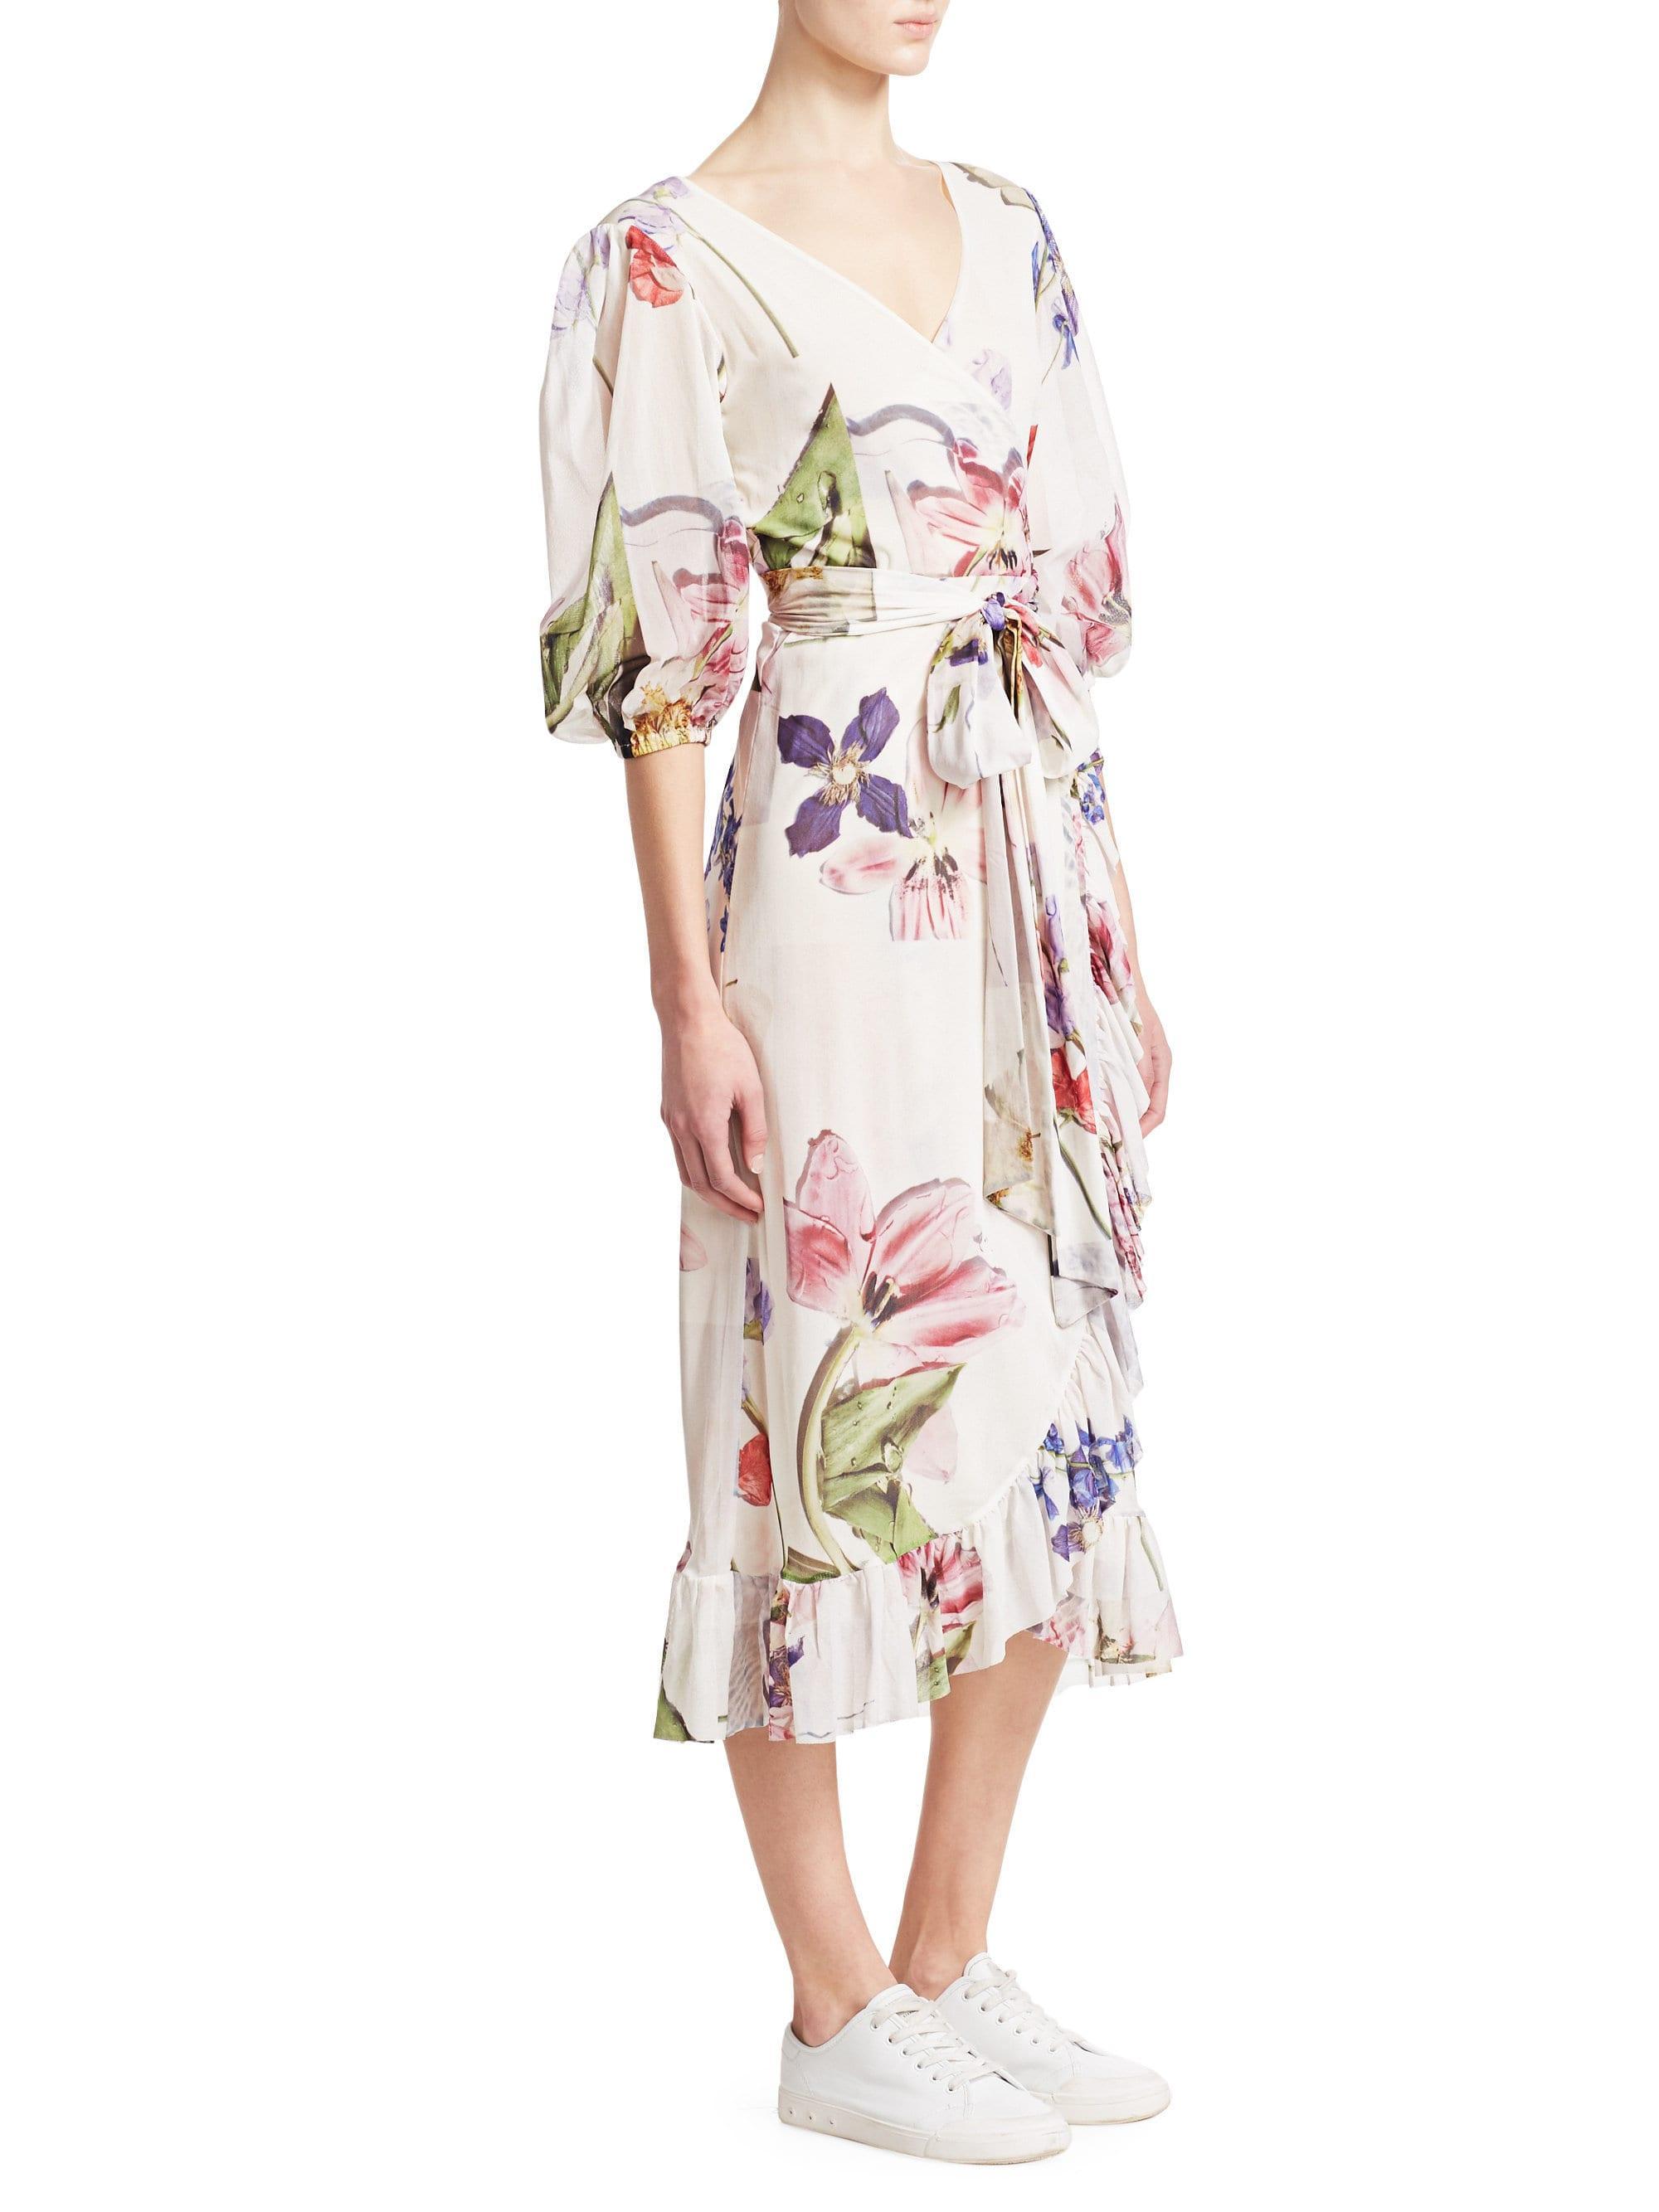 76f3bd1b ... Printed Mesh Ruffled Wrap Dress - Bright White - Lyst. View fullscreen